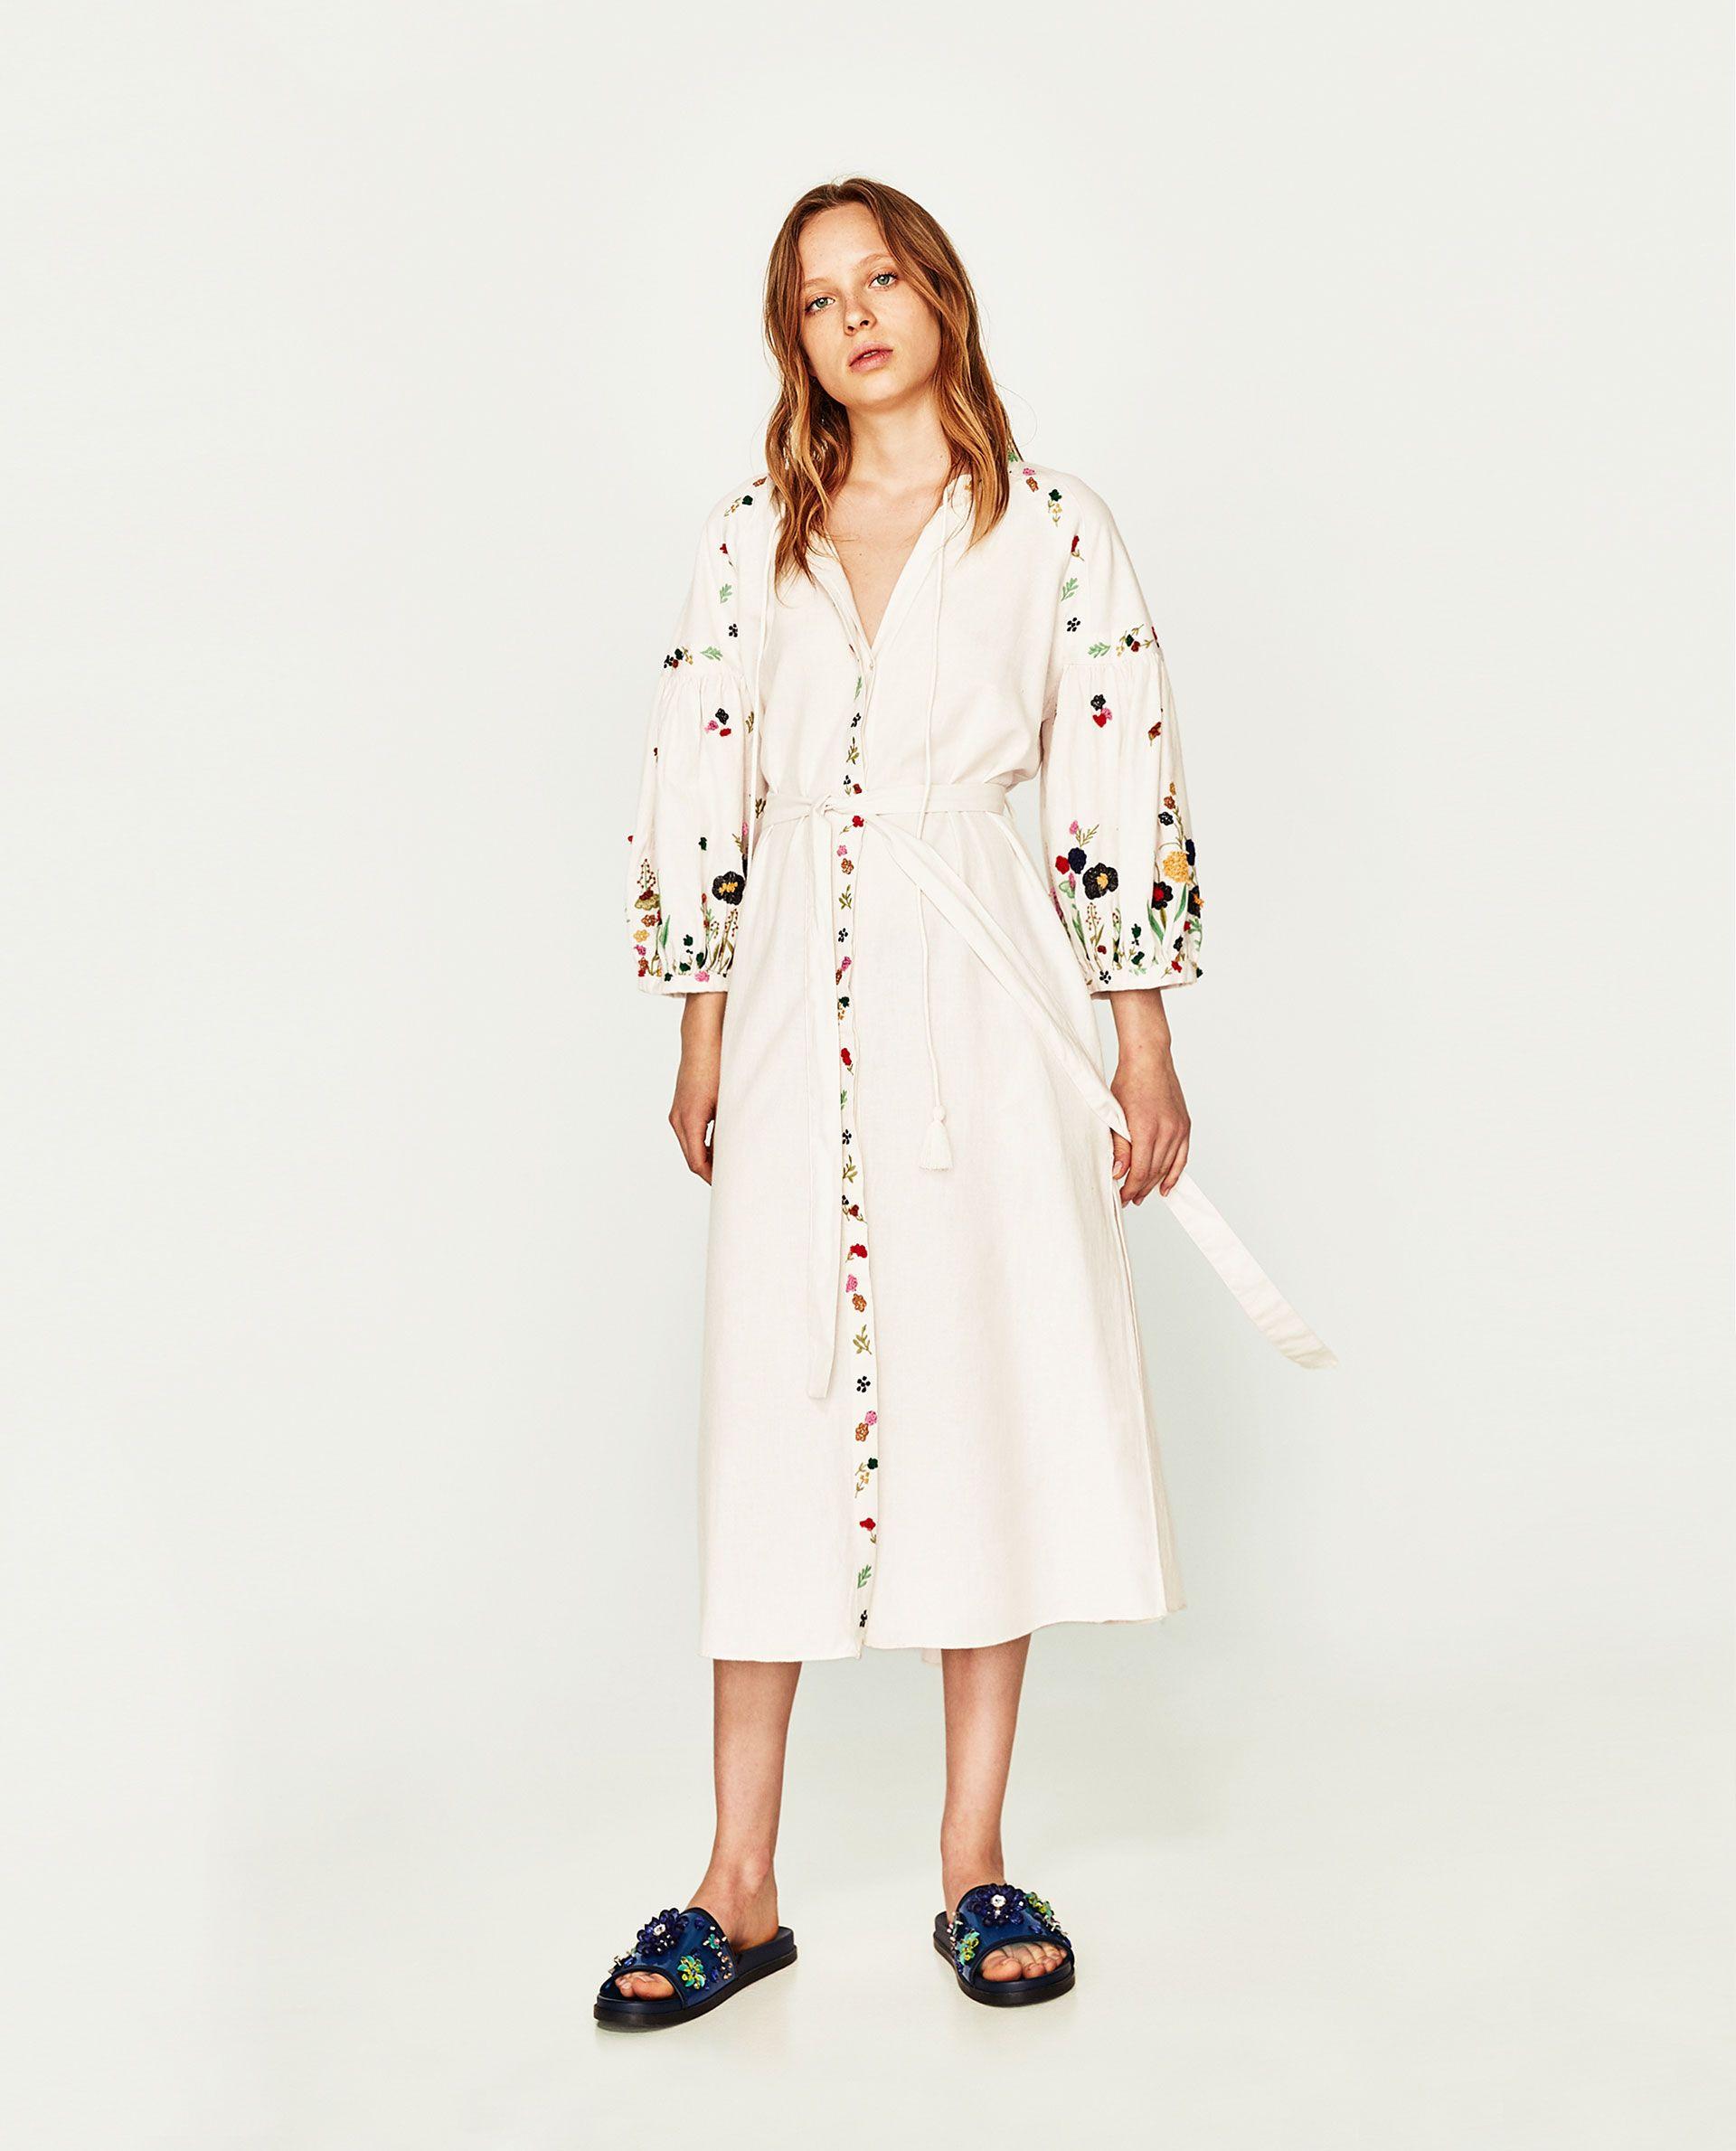 8fc476cf171a3b ZARA - TRF - LONG EMBROIDERED TUNIC ZARA Long Tunic Dress, Shirt Dress,  Embroidered